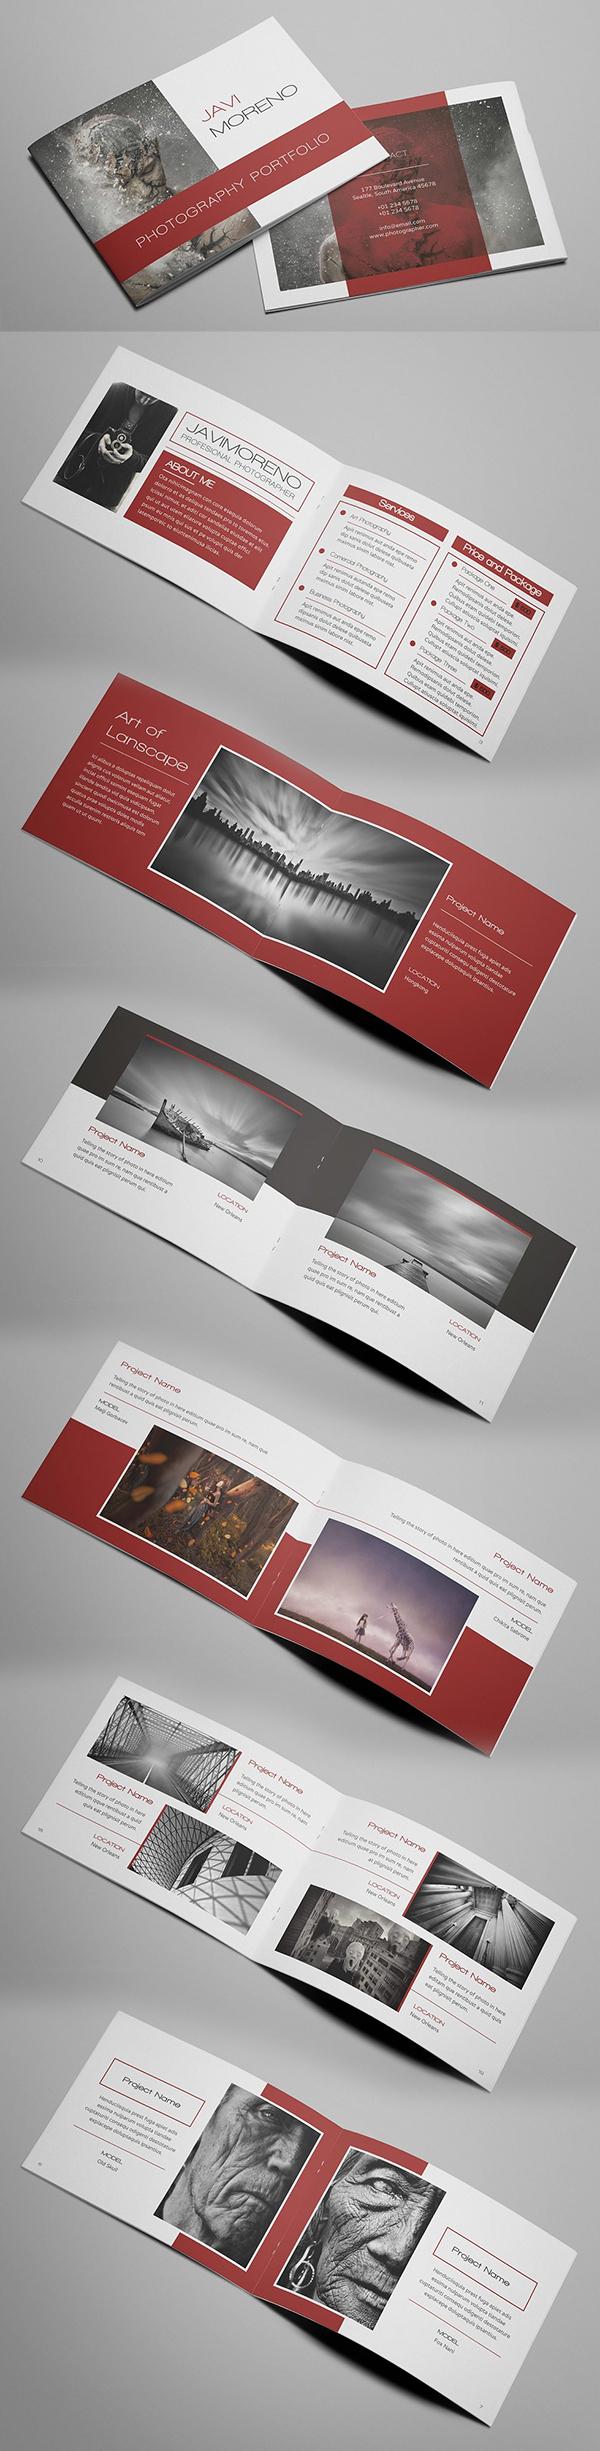 Elvira - Photography Brochure